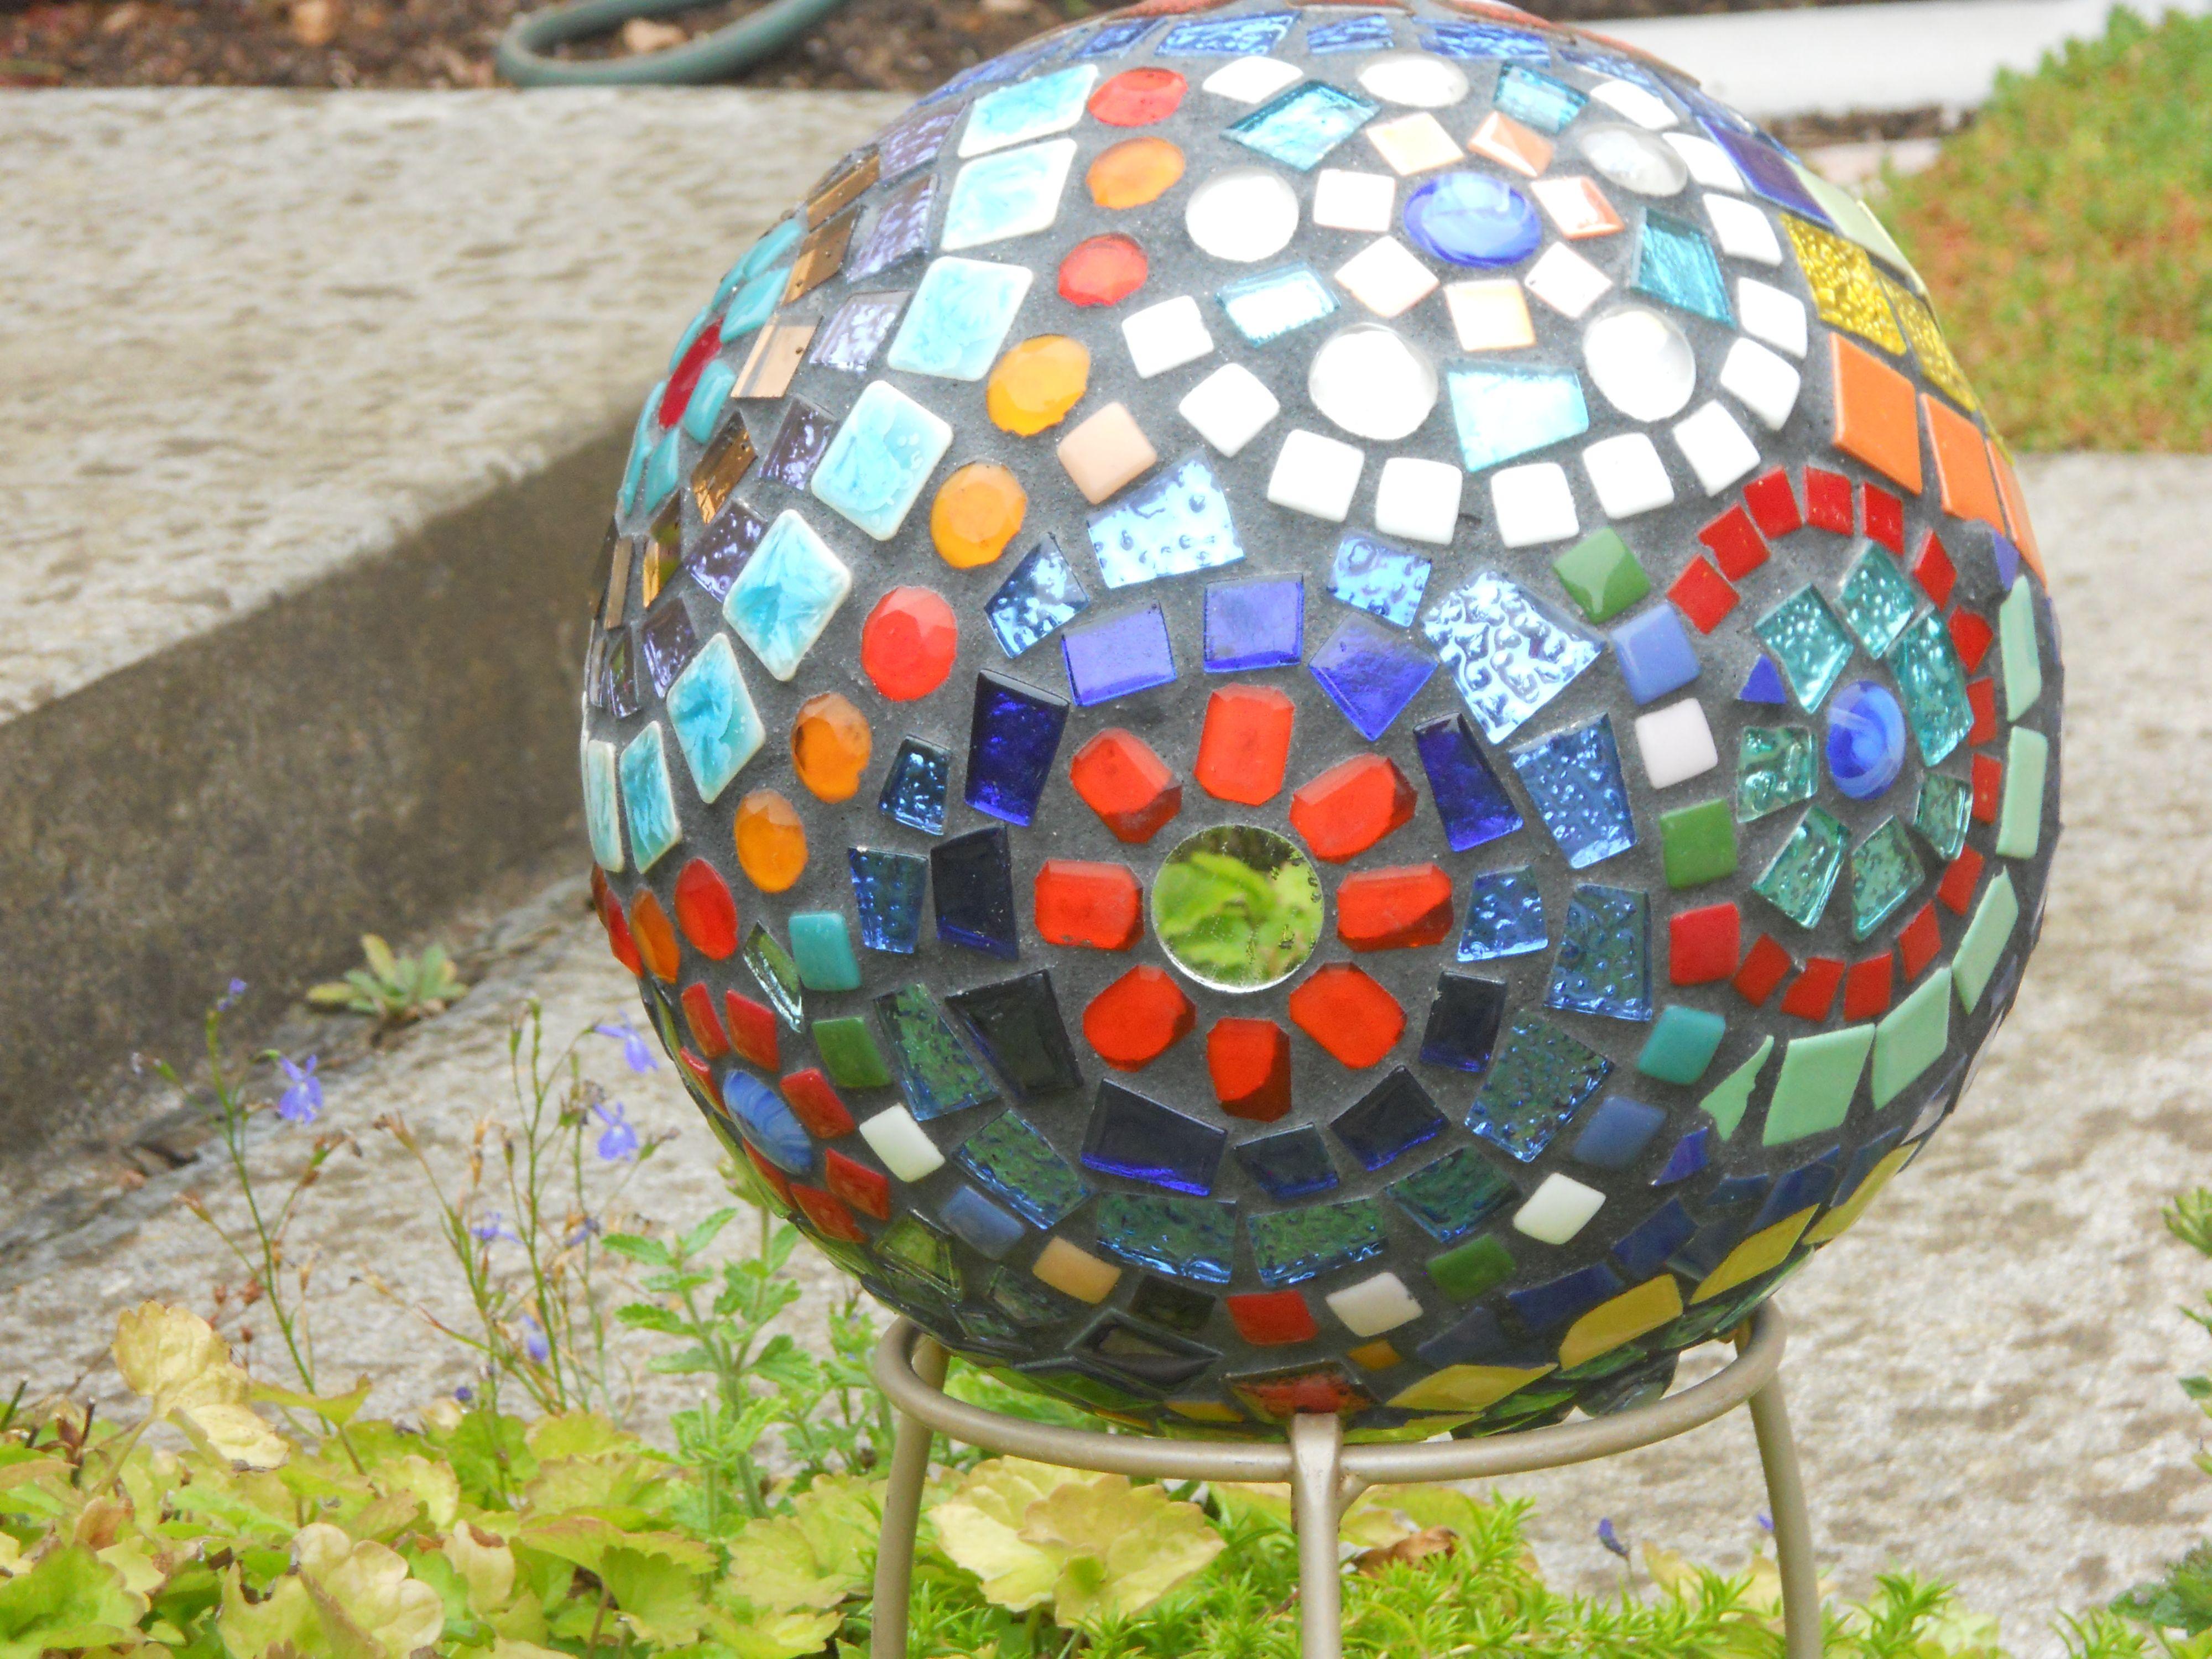 Mosaic bowling ball mosaic garden gazing balls stakes pinterest